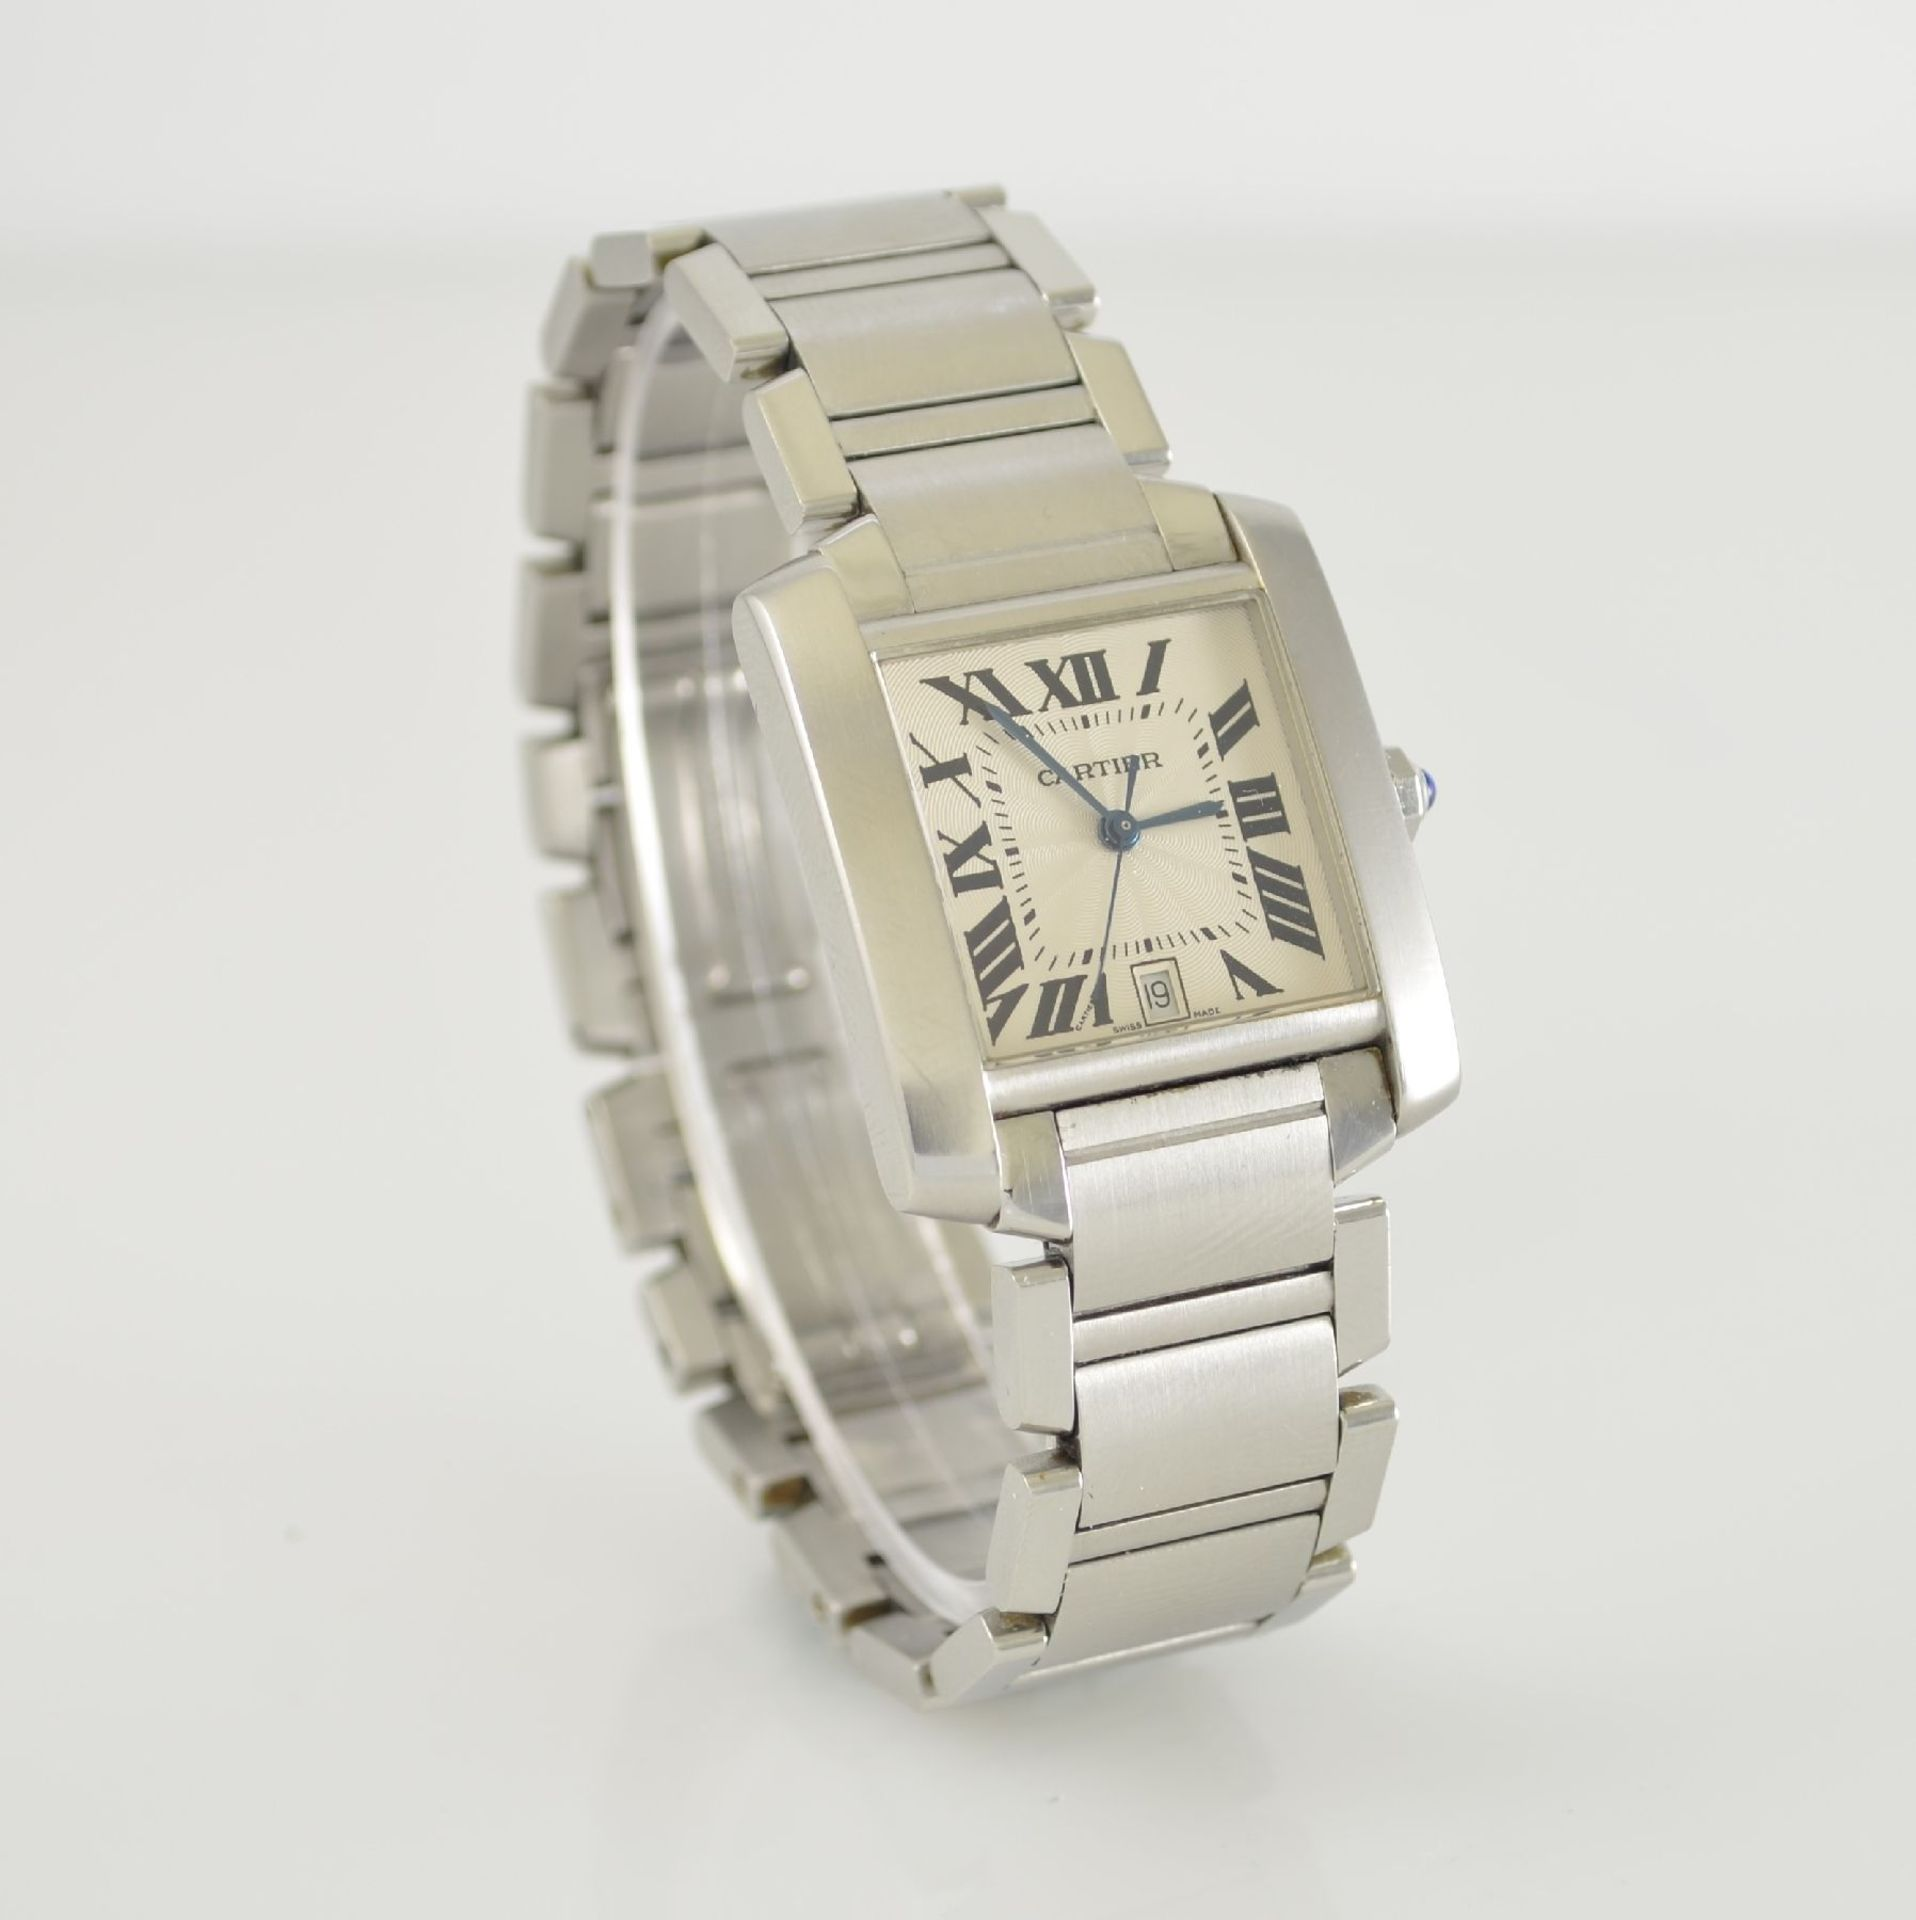 CARTIER Armbanduhr Tank Francaise, Automatik, Ref. 2302, Edelstahlgeh. inkl. Gliederband m. dopp. - Bild 4 aus 8